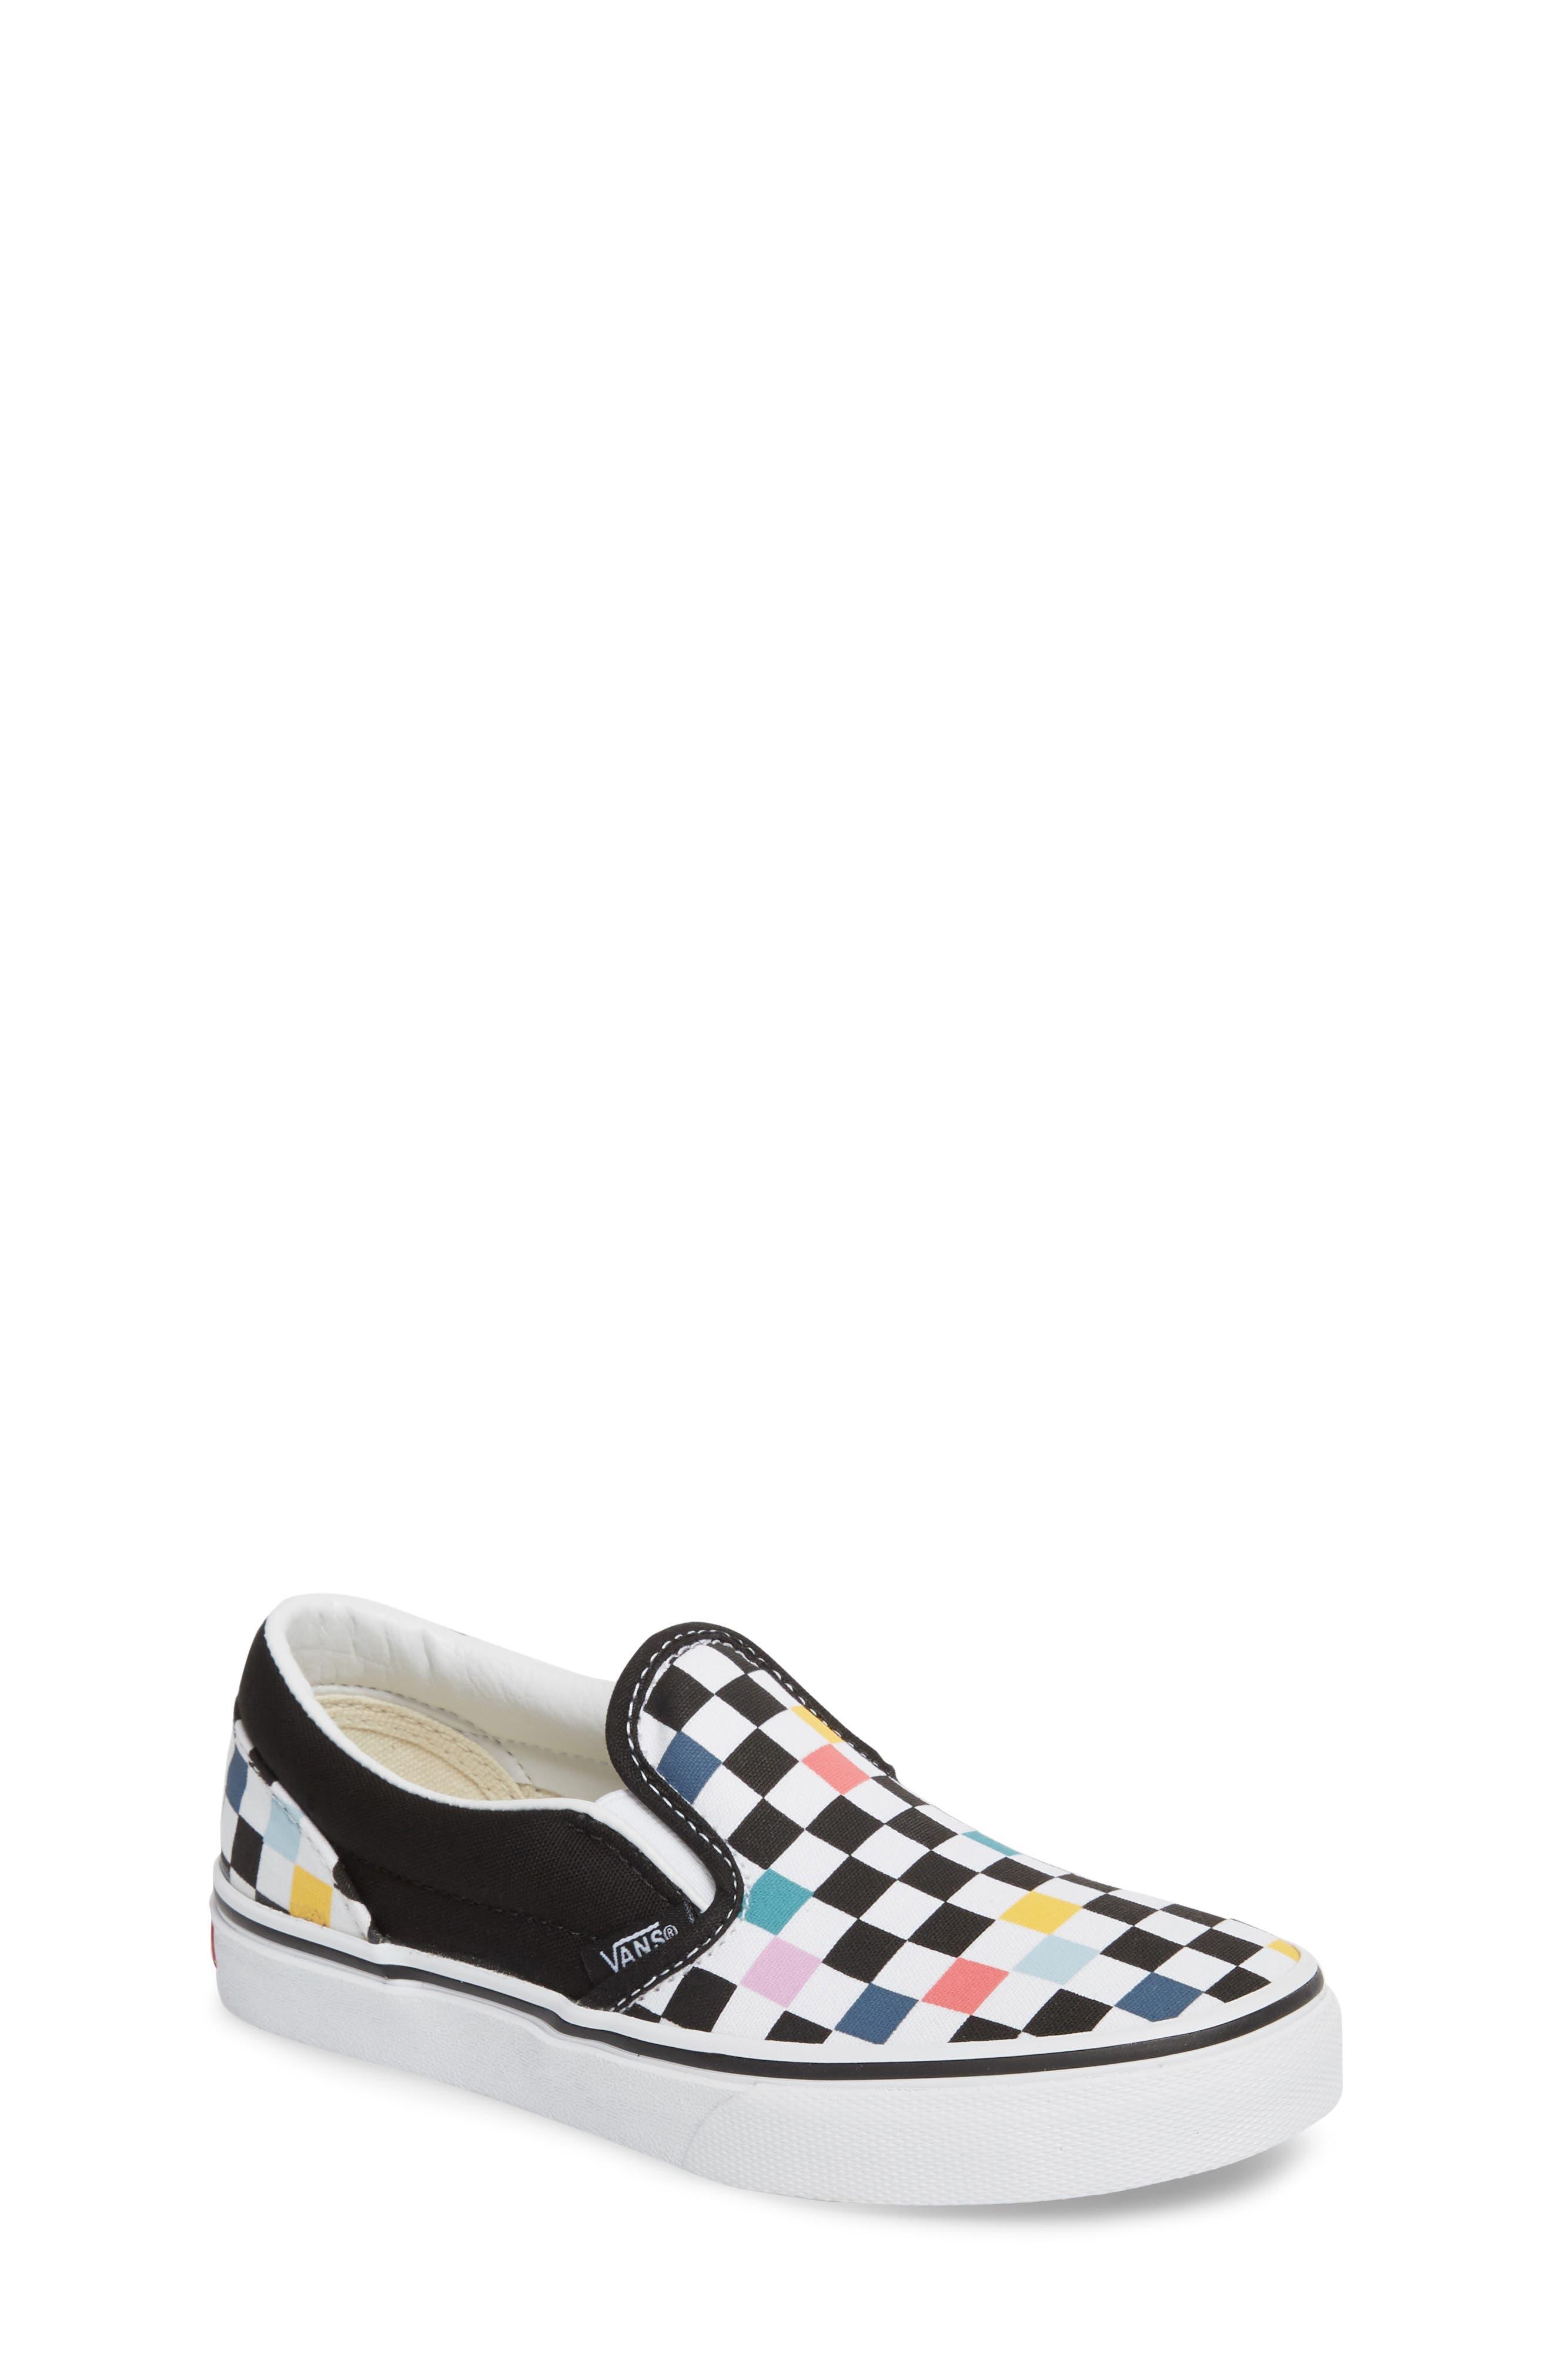 Party Check Slip-On Sneaker,                         Main,                         color, Party Checker Multi/ Black